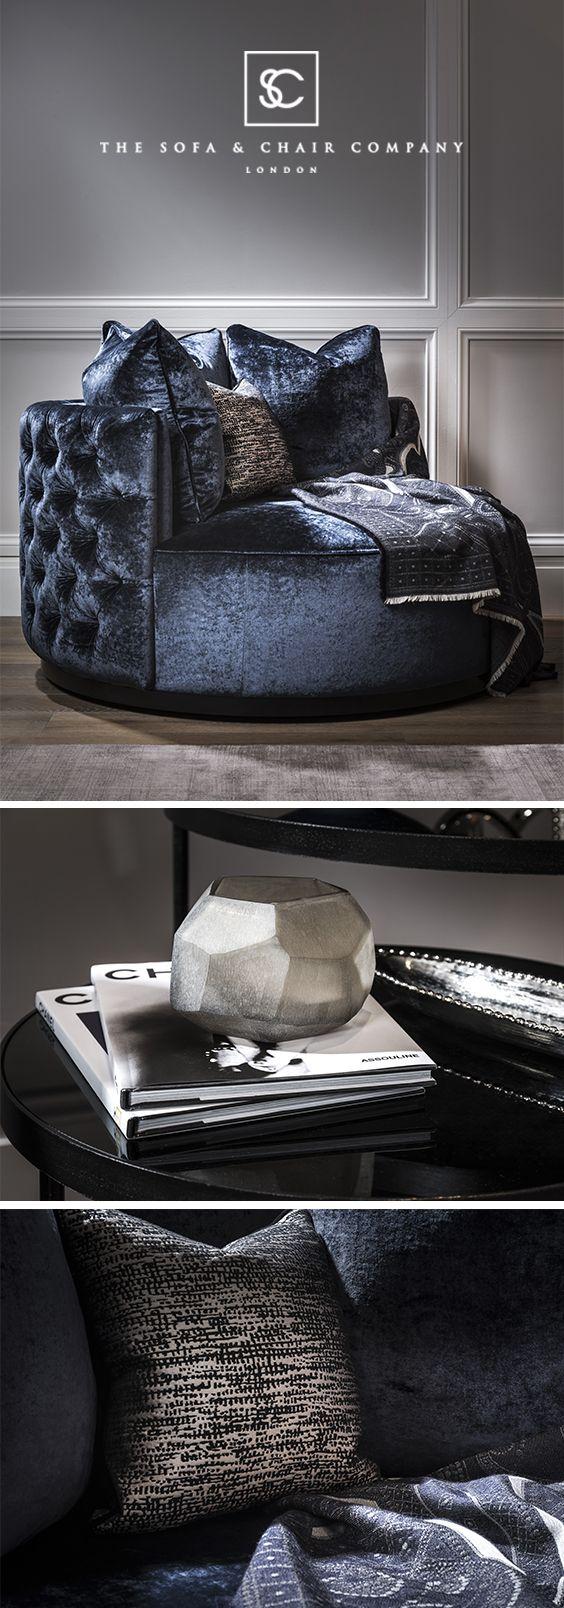 The Sofa & Chair Company   Luxury Interiors   Bespoke & Handmade Furniture   Designed in London